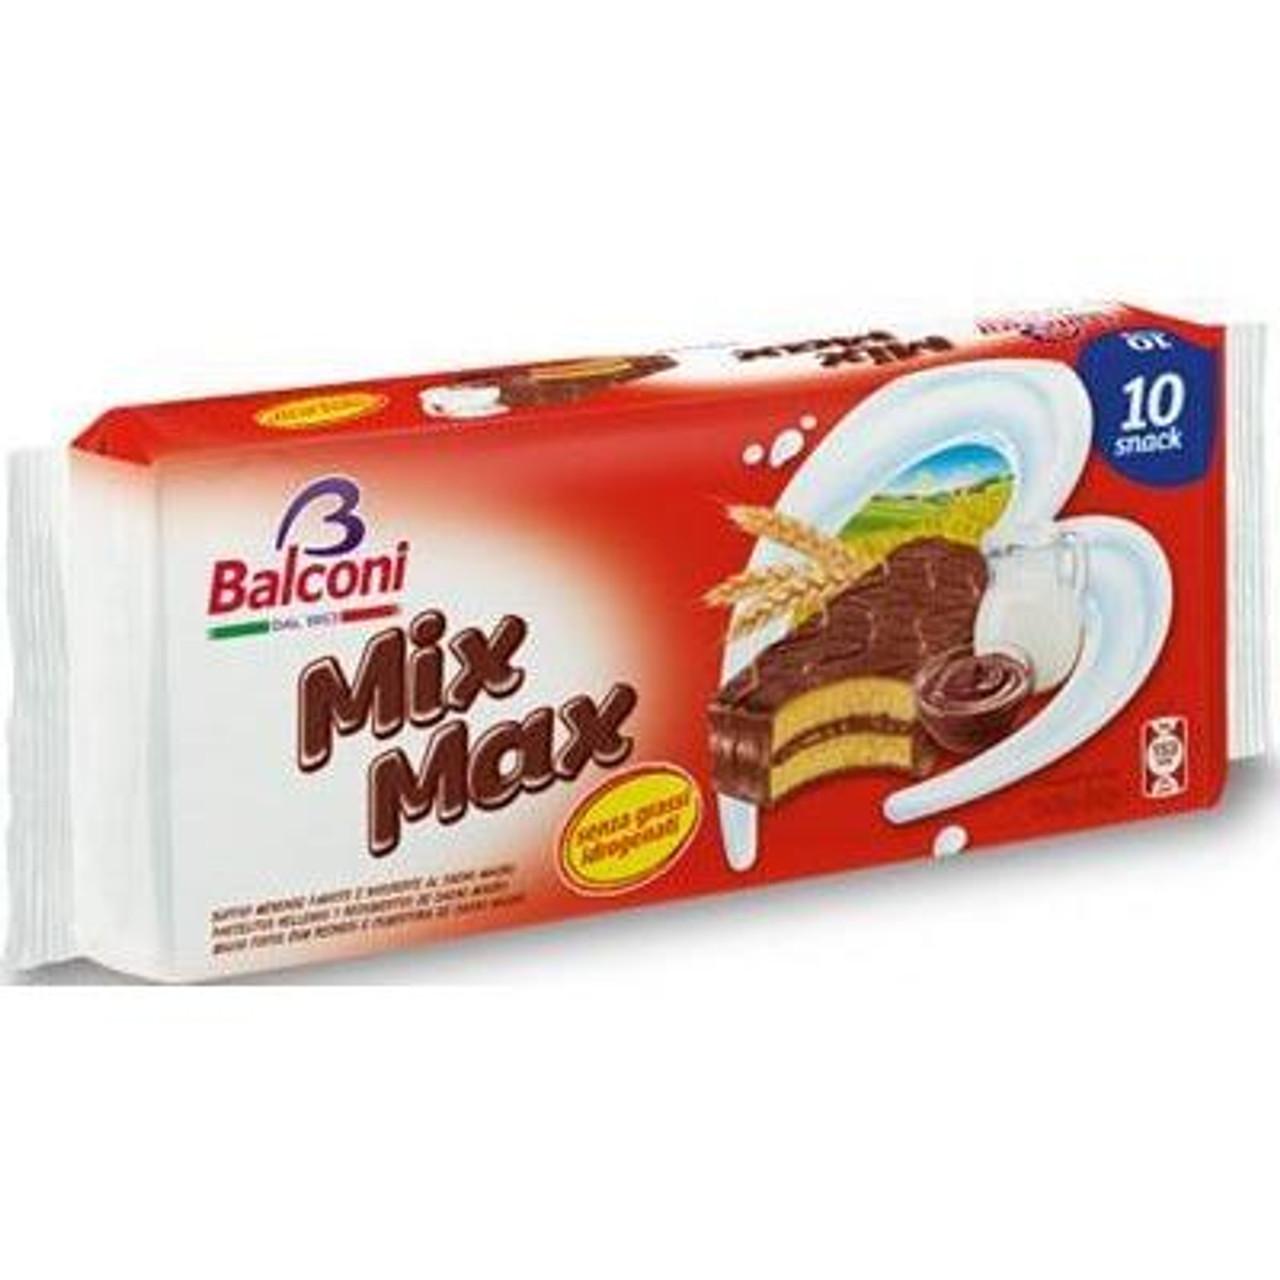 Balconi MixMax Cocoa Sponge Cake